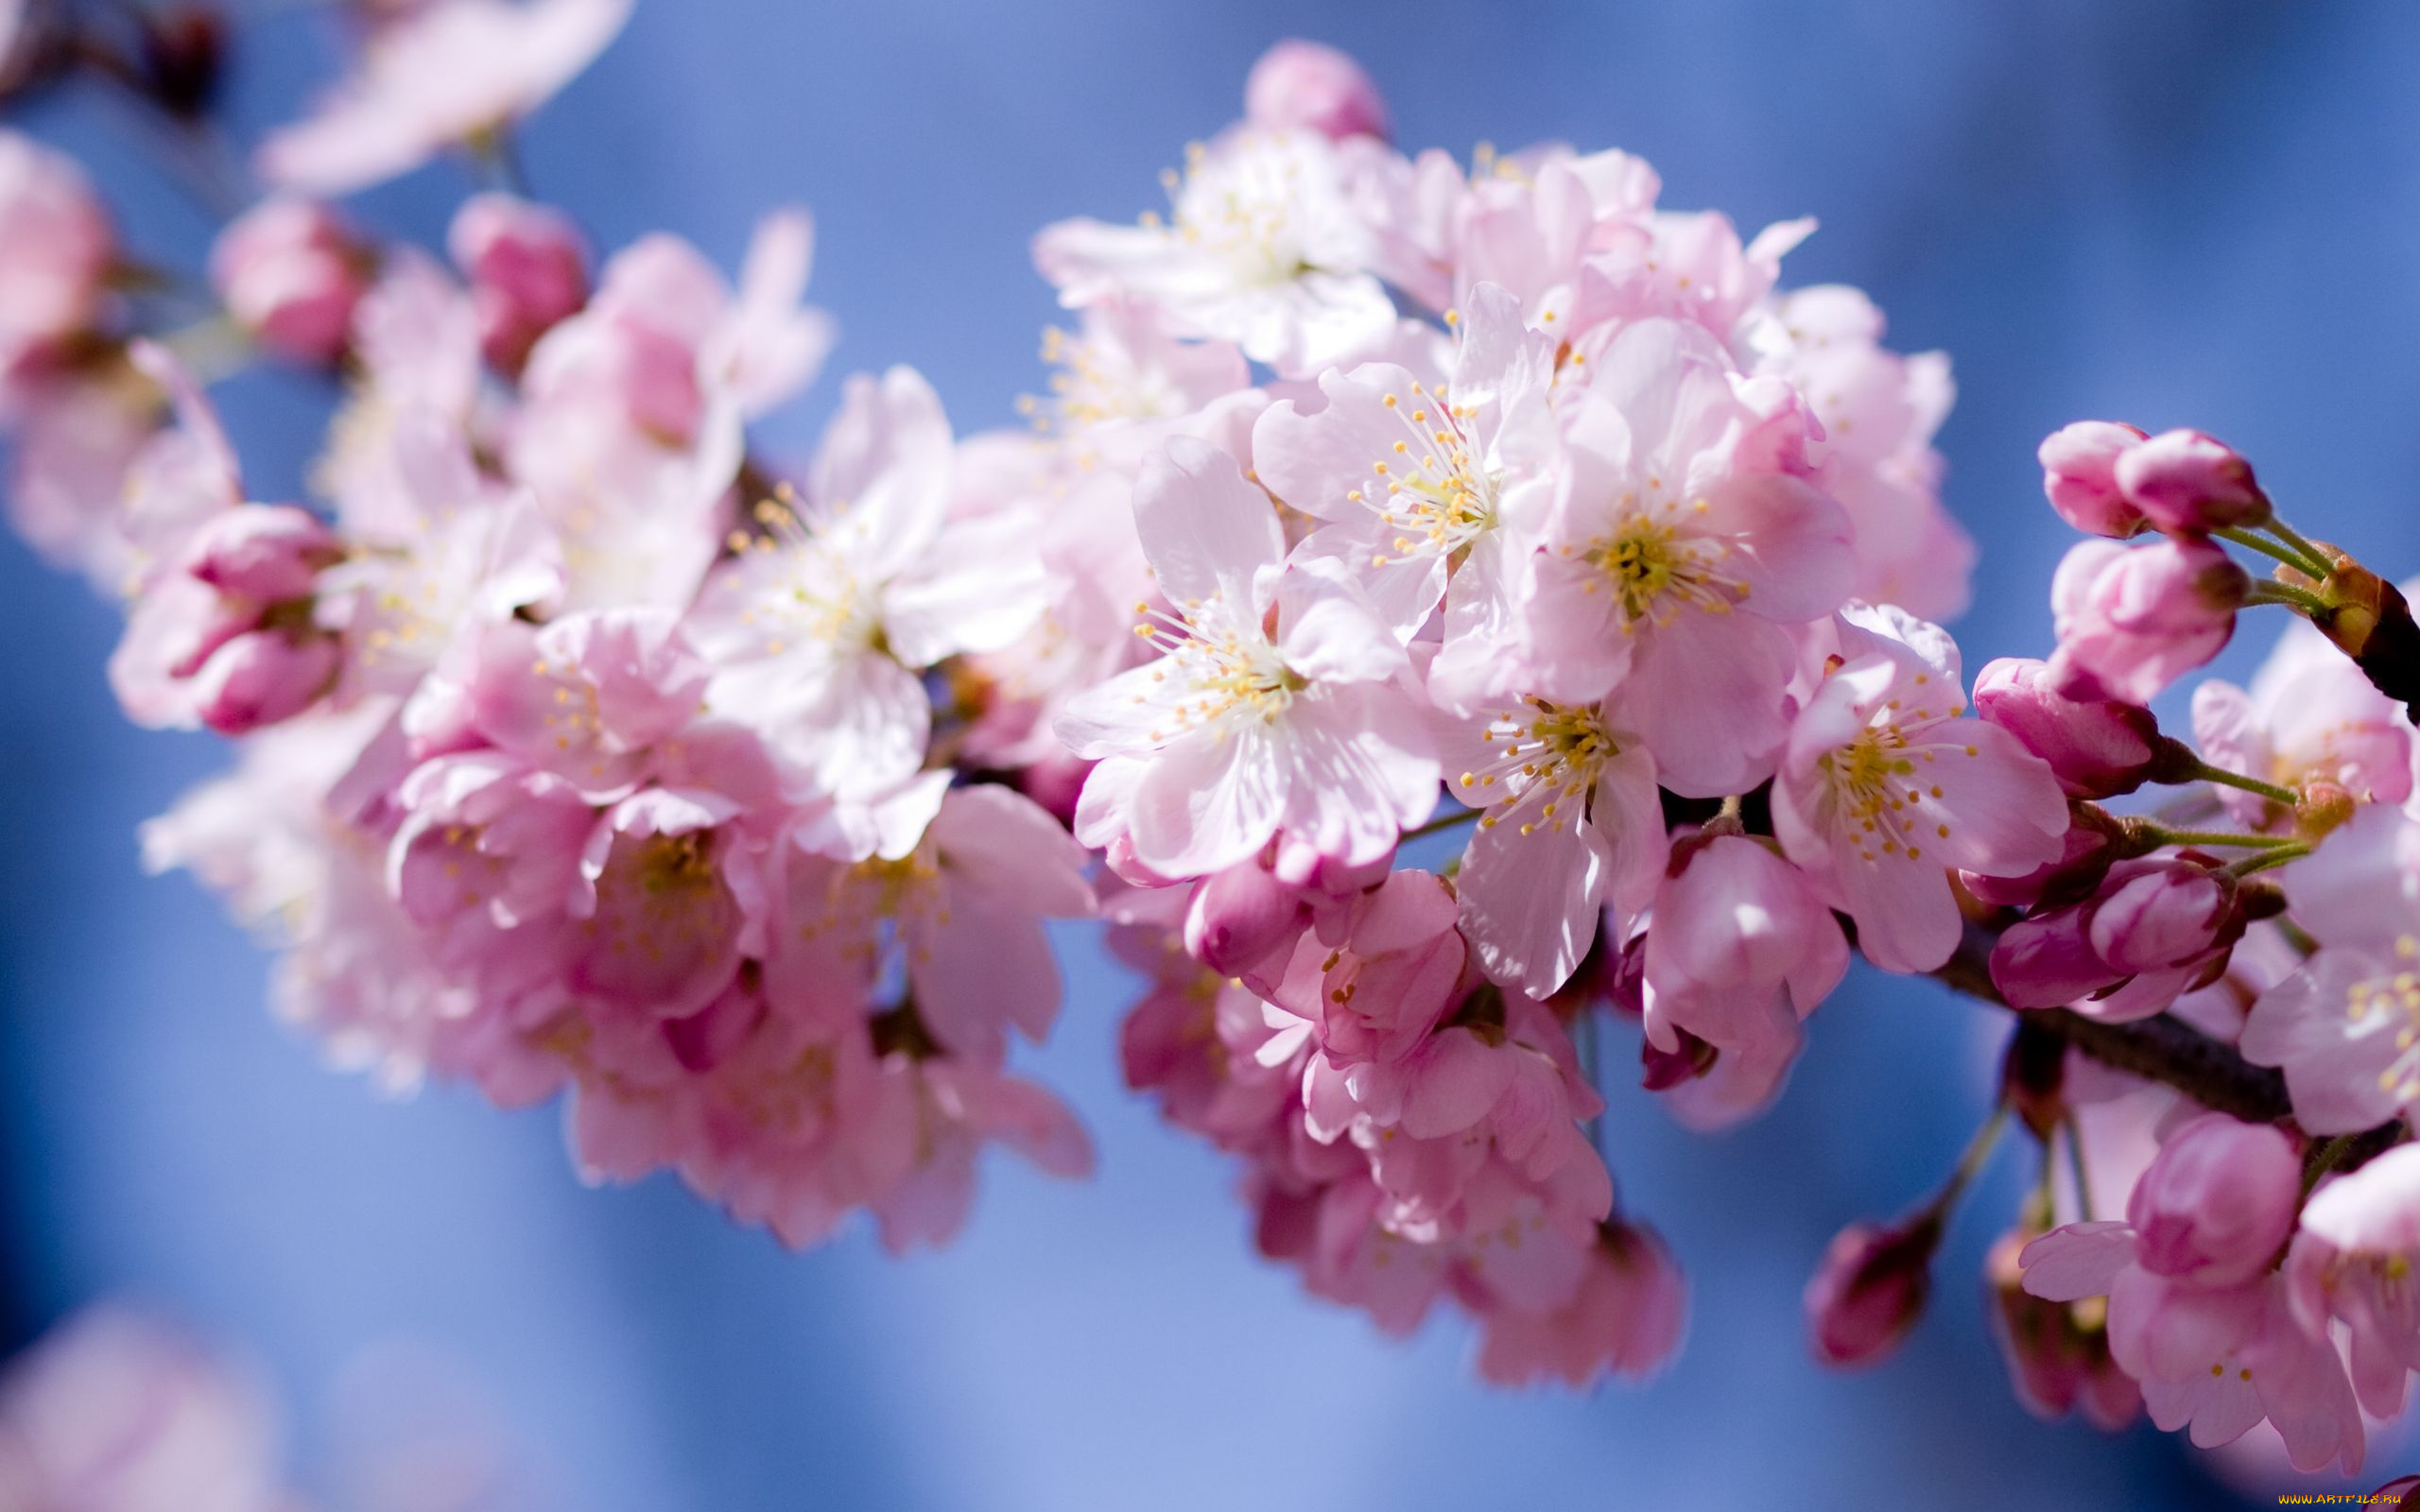 Именем никита, открытки с цветами вишни